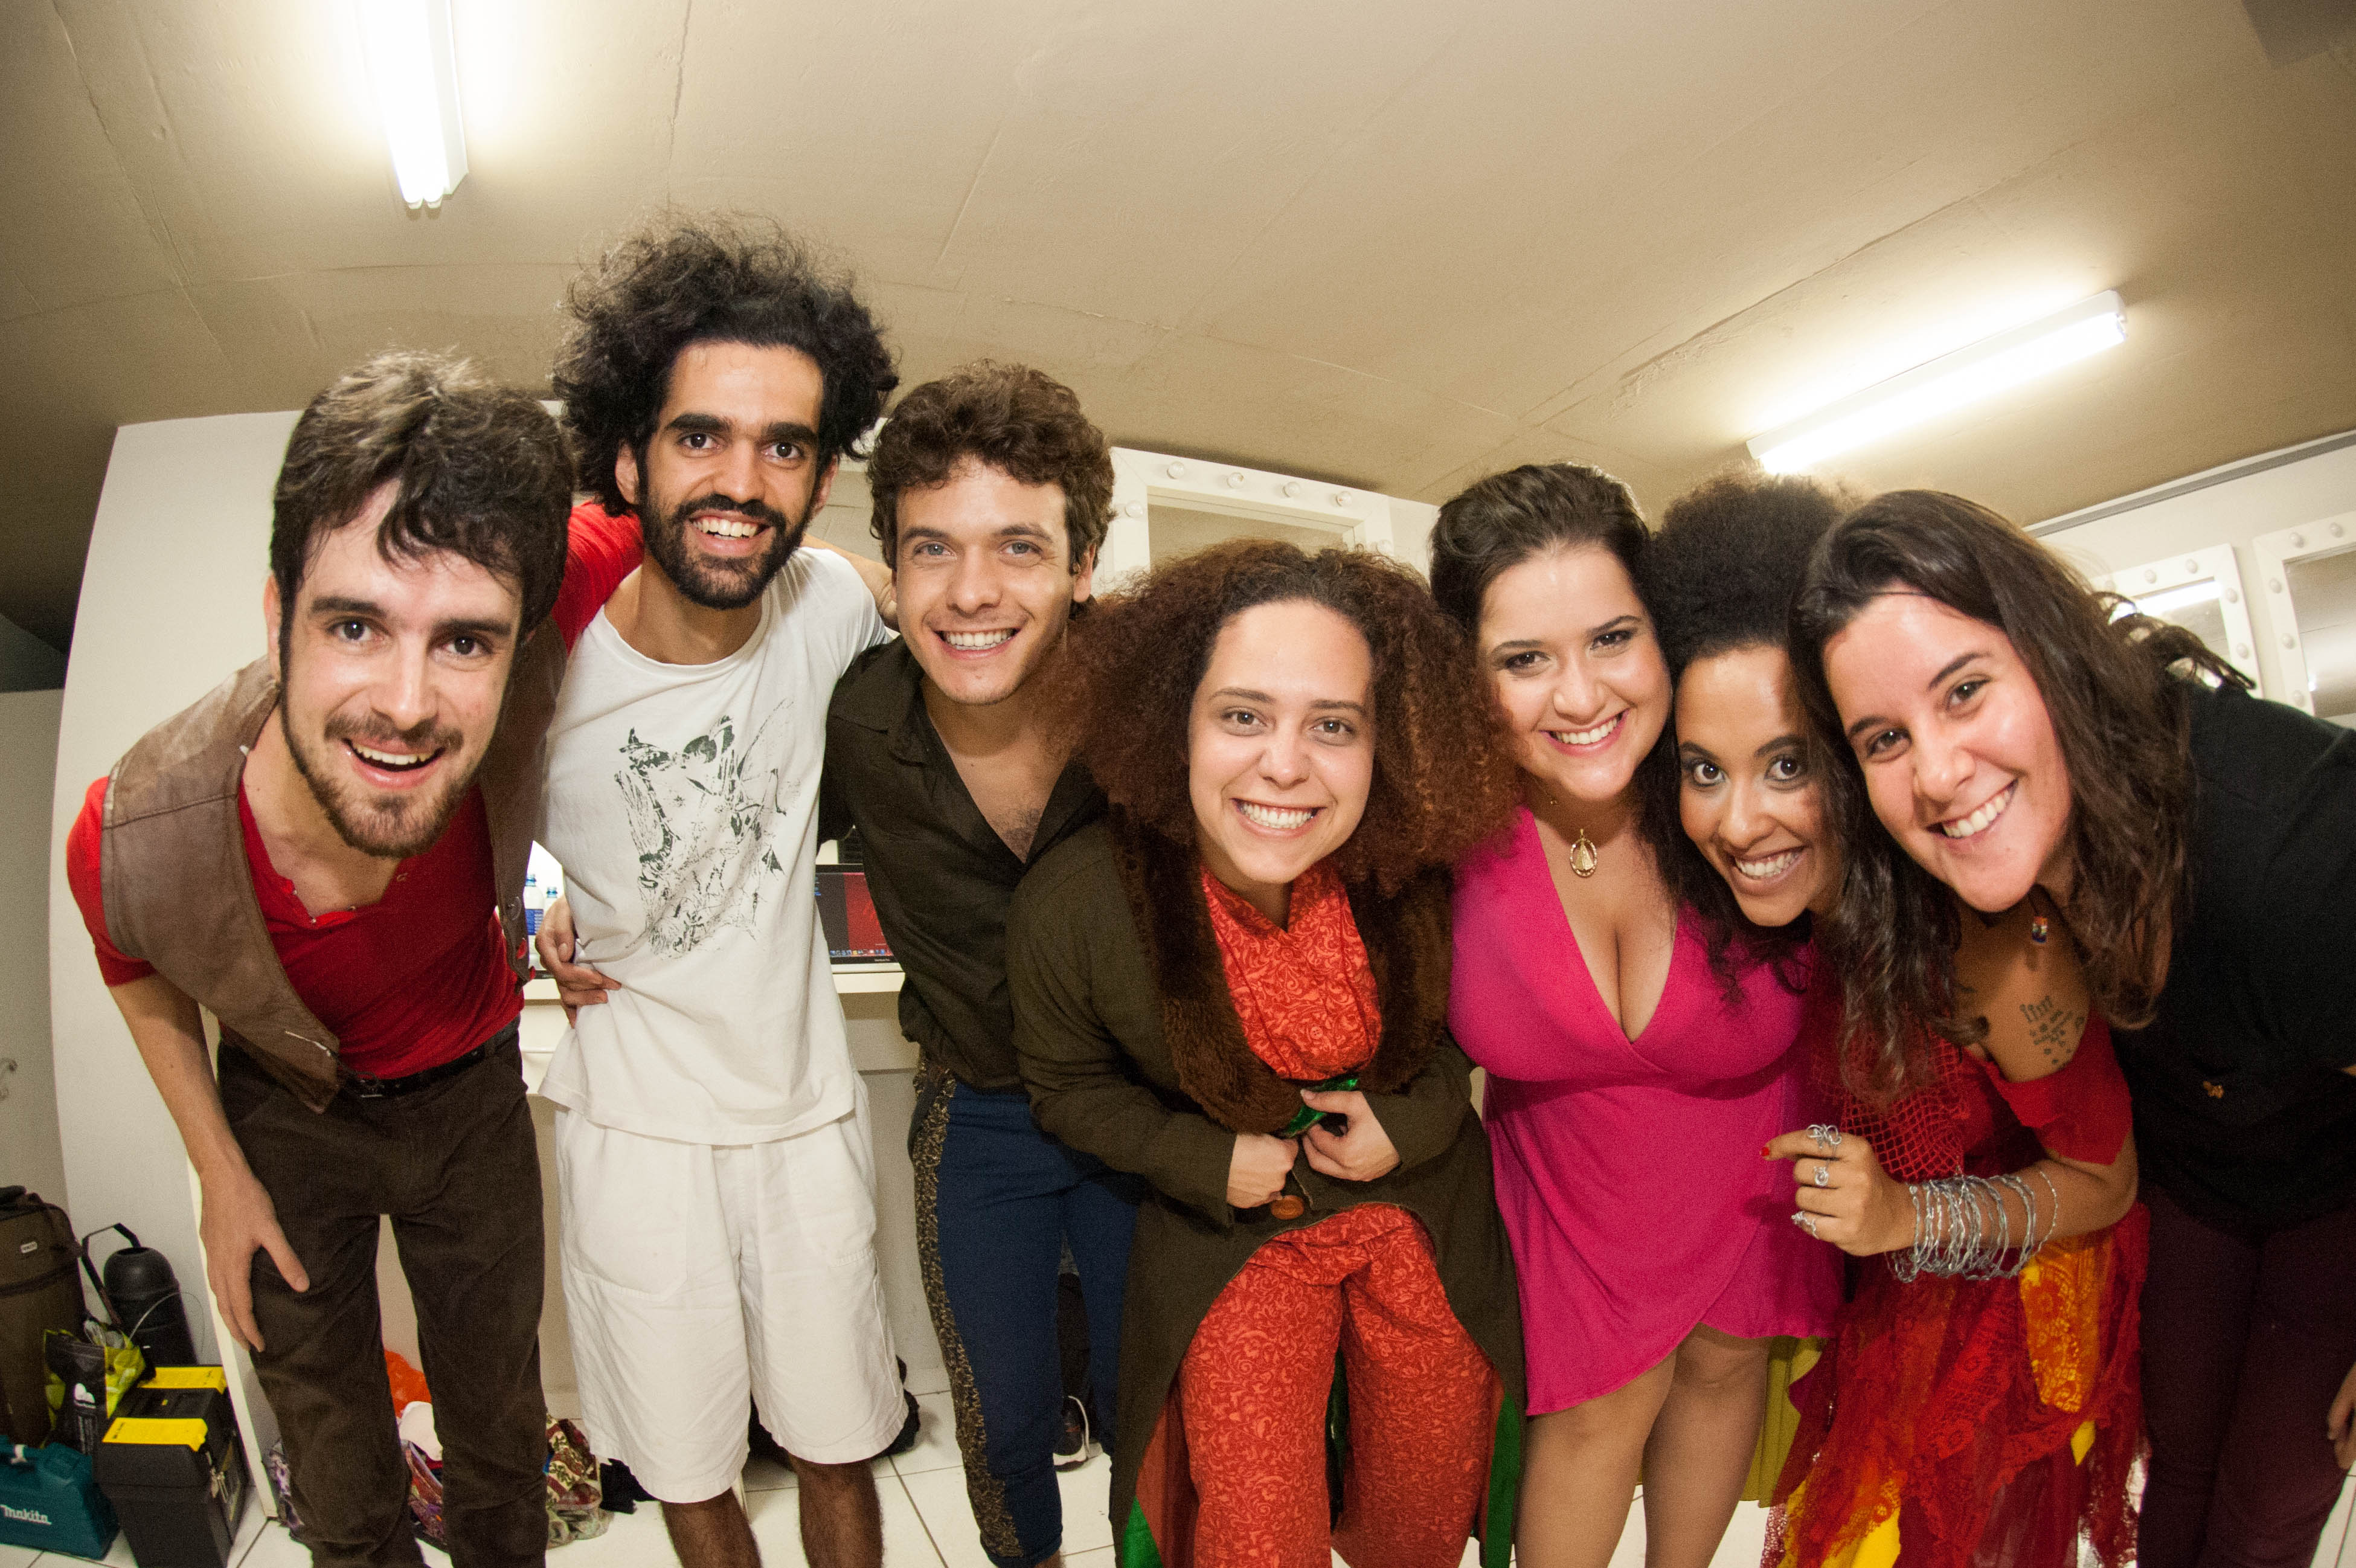 Equipe Cartomante por Felipe Ando